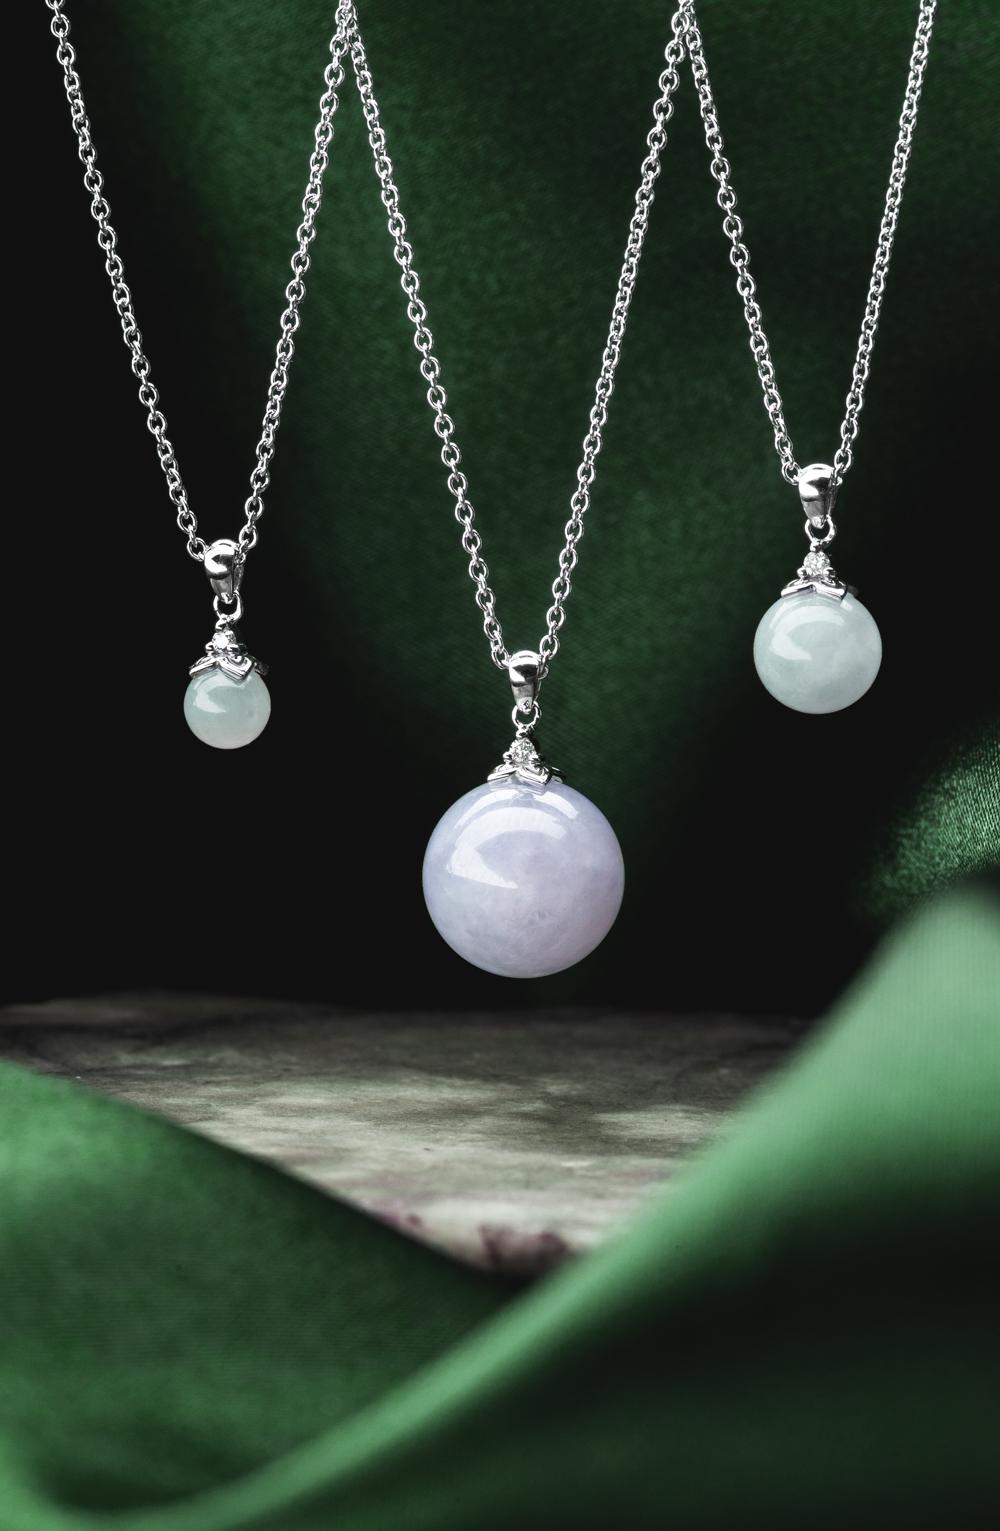 Choo-Yilin---The-Classics-Necklaces.jpg